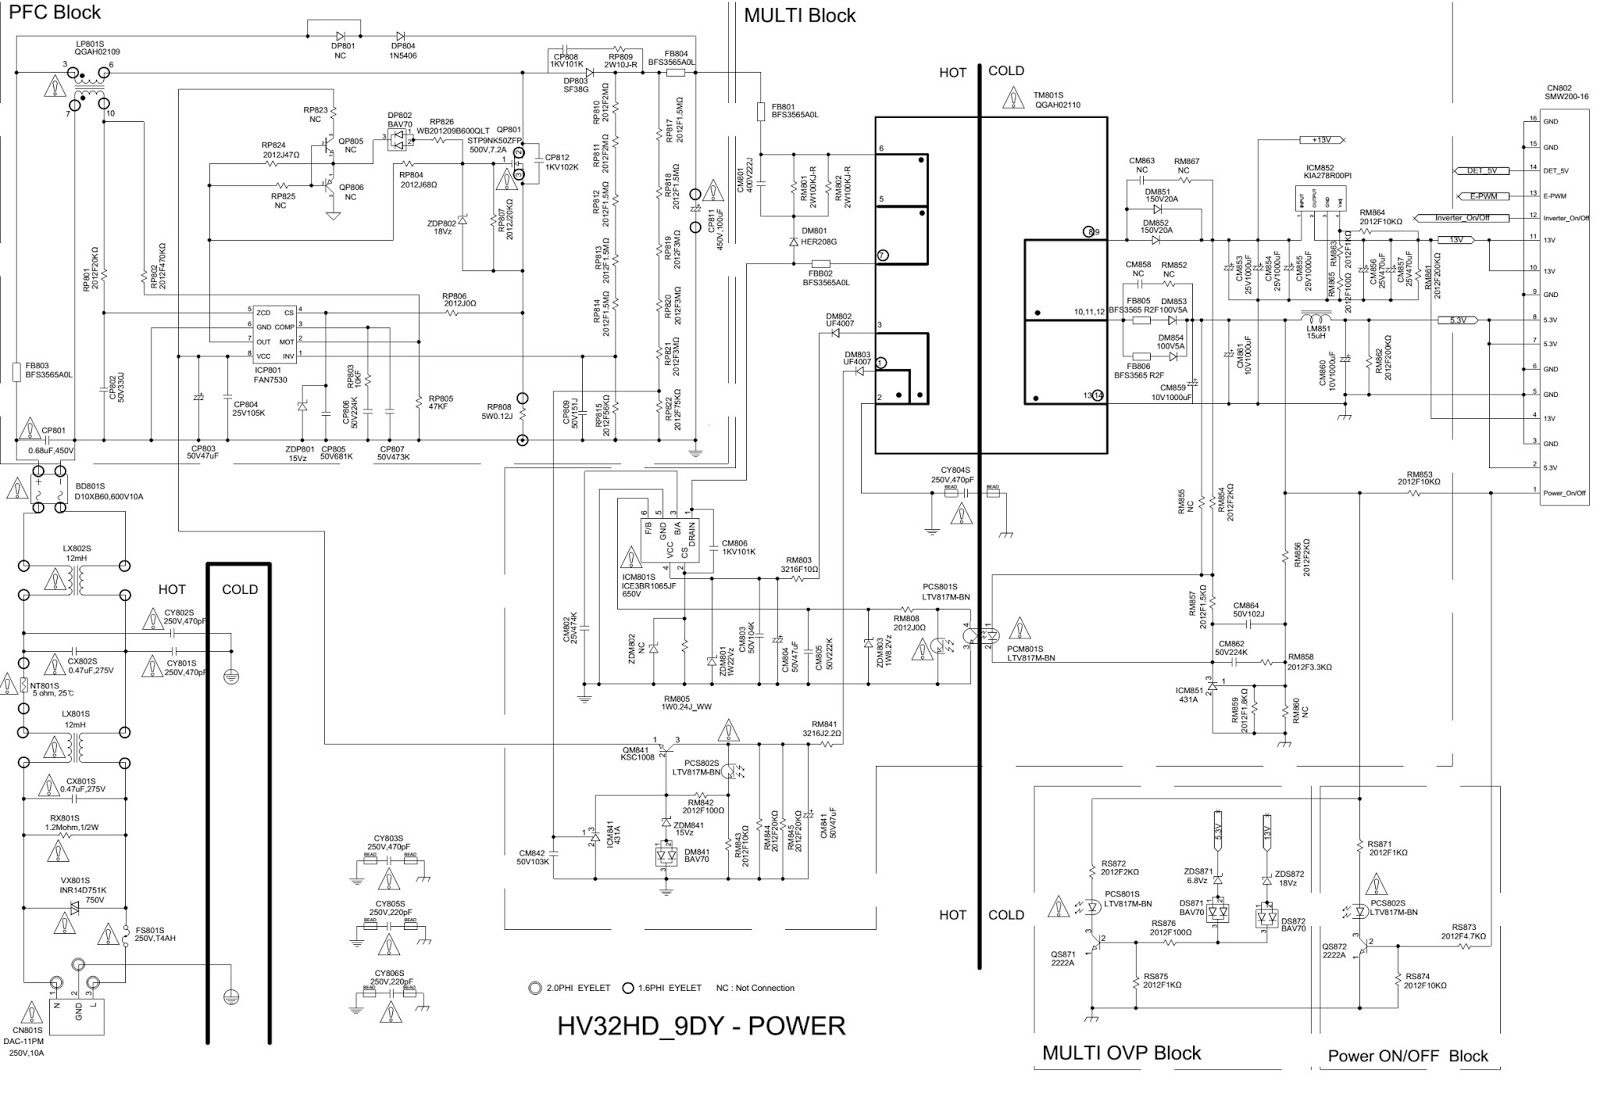 contemporary 55 samsung tv wiring diagram image collection rh itseo info Panasonic TV Wiring Diagrams Panasonic TV Wiring Diagrams